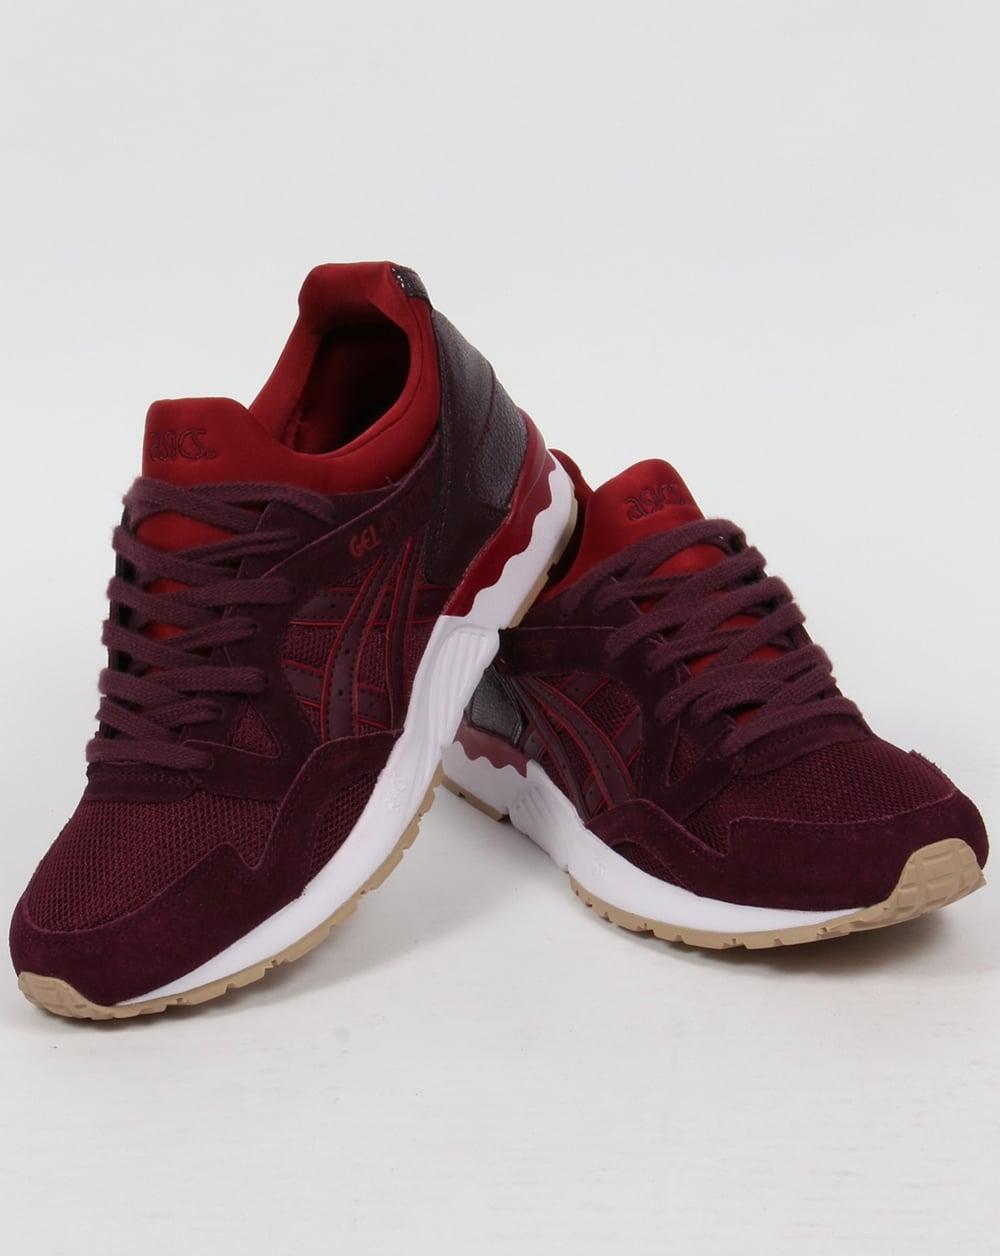 Asics Gel 5 Lyte V Baskets Rioja V Rouge , , 5 , chaussures , coureurs , baskets d256dec - freemetalalbums.info